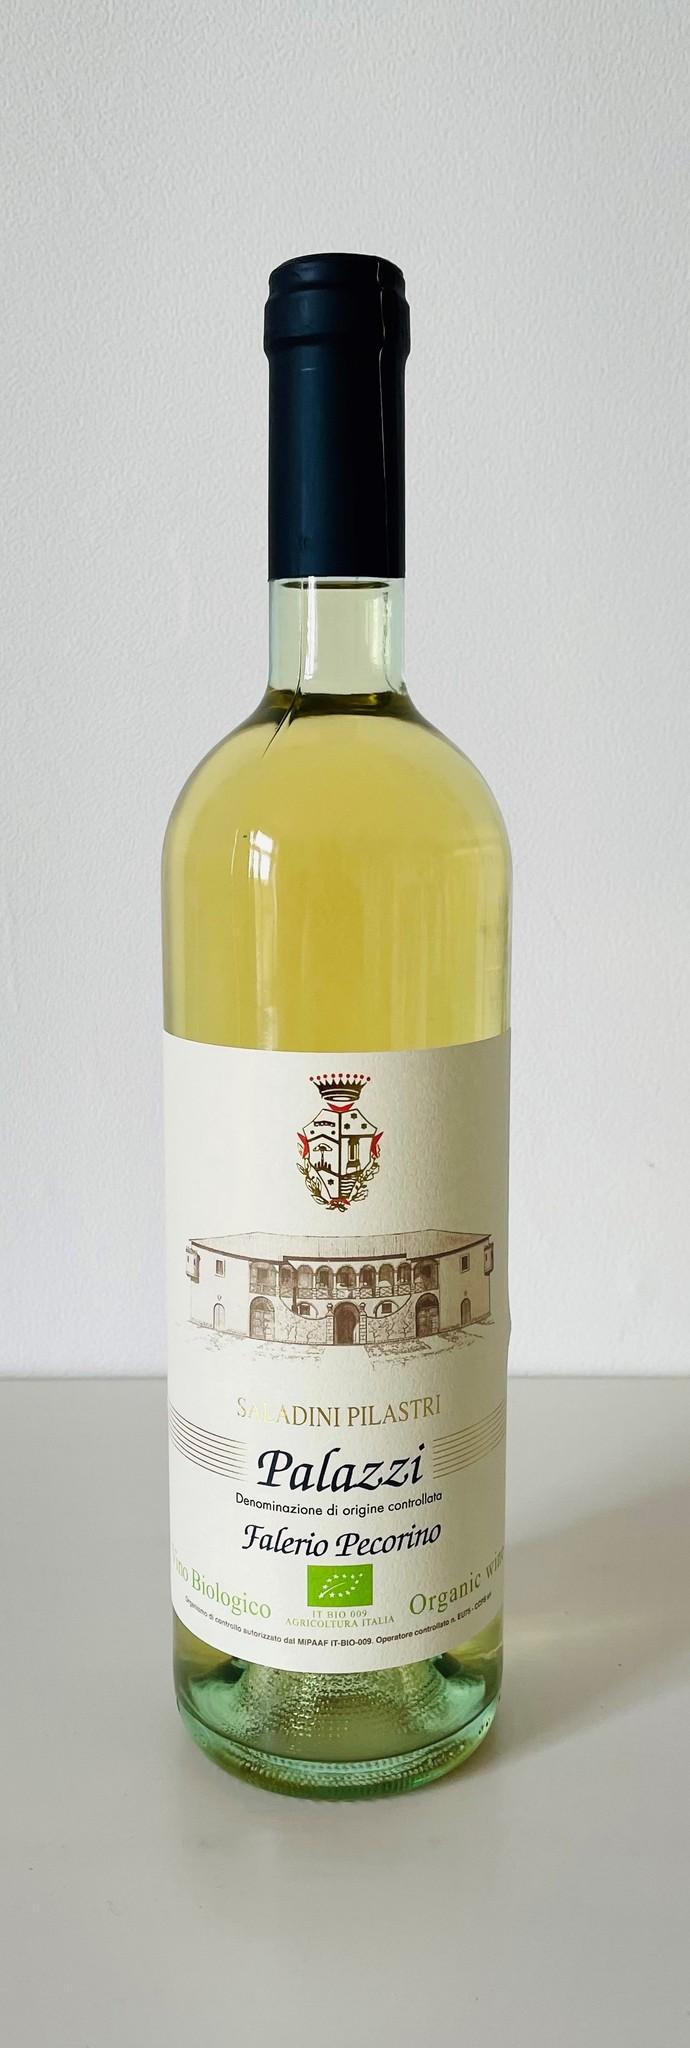 Saladini Pilastri, Falerio Palazzi, 2020